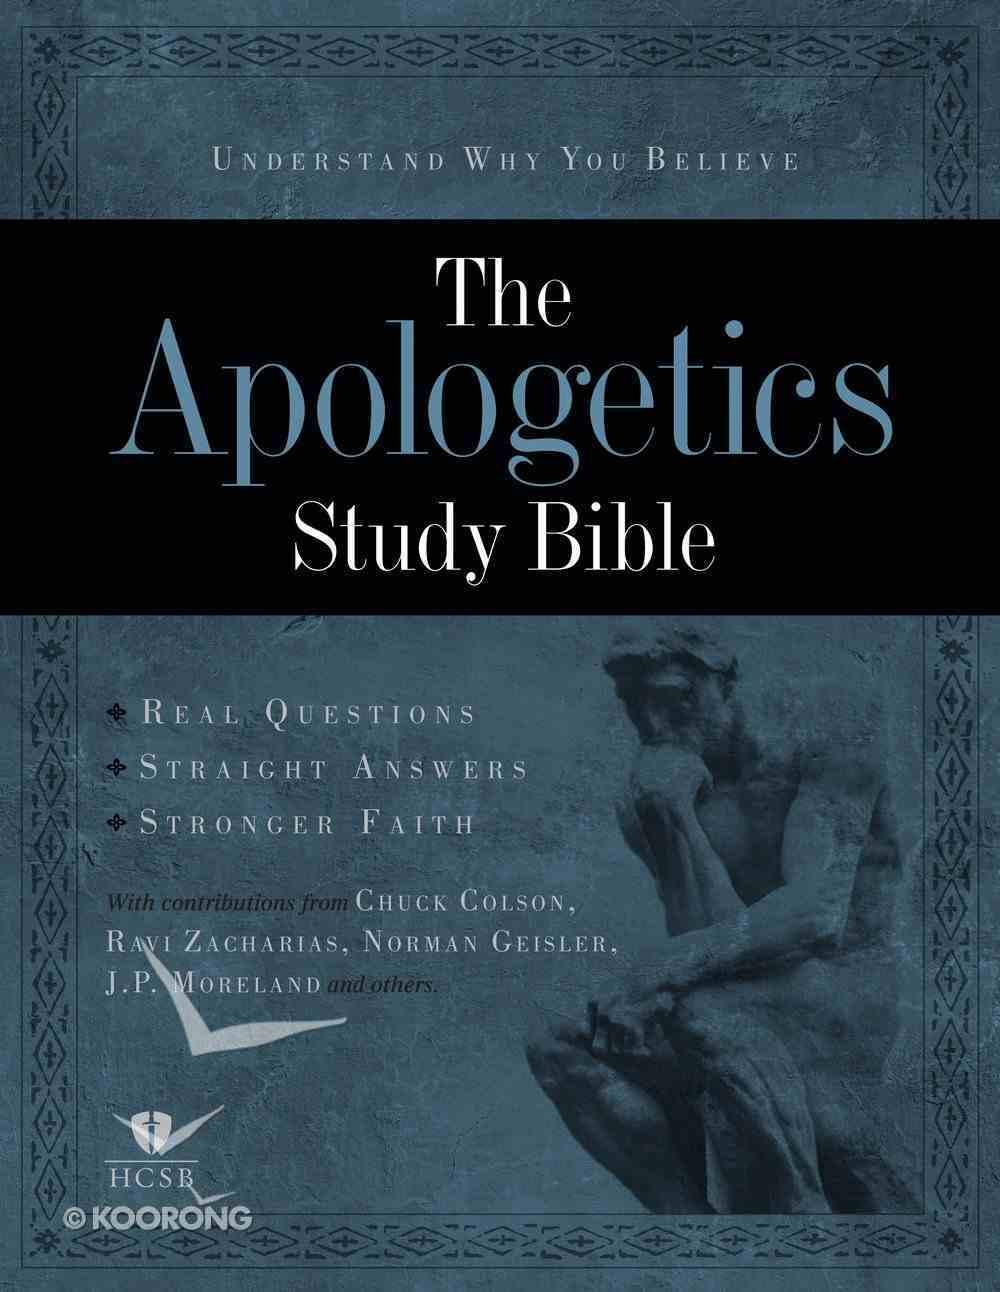 HCSB Apologetics Study Bible Black Genuine Leather (Indexed) Genuine Leather